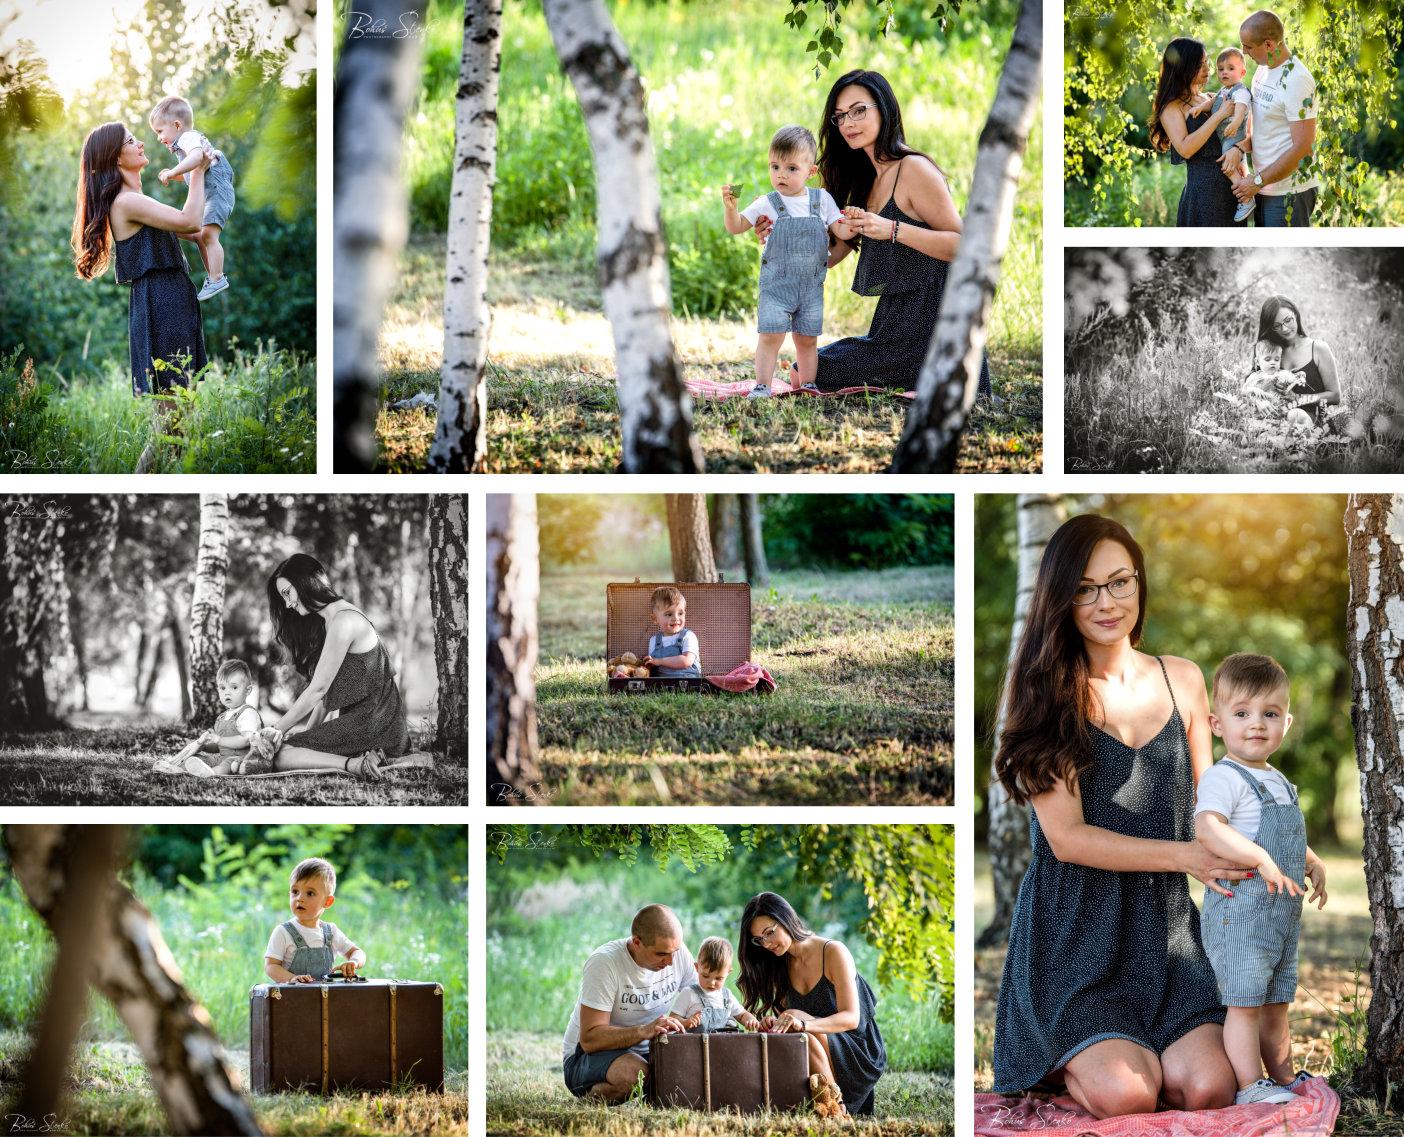 rodinny fotograf kosice